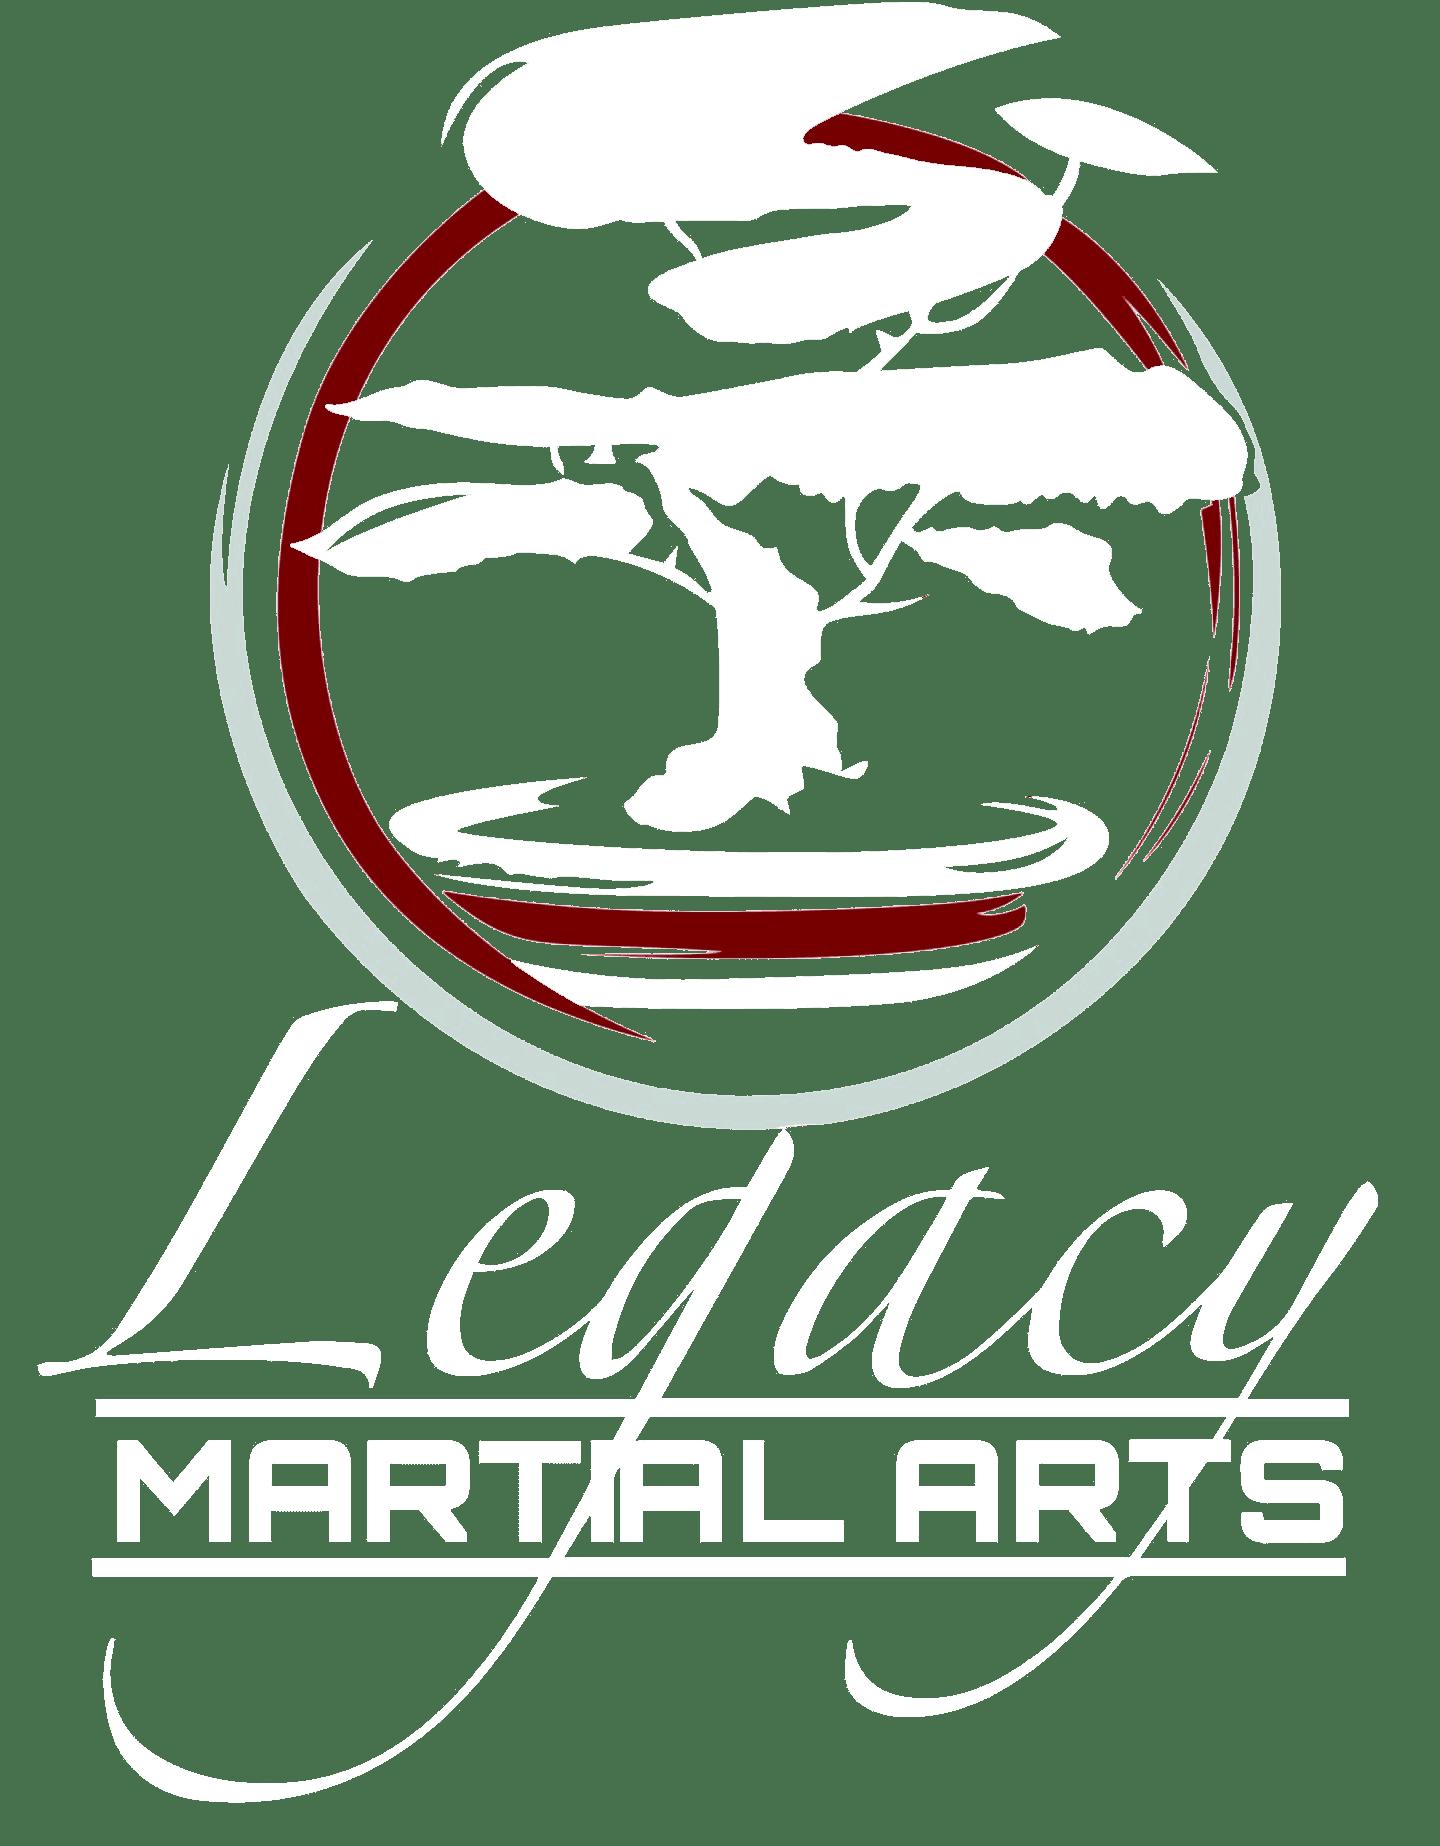 Legacymalogowhite, Legacy Martial Arts in  Kennett, PA